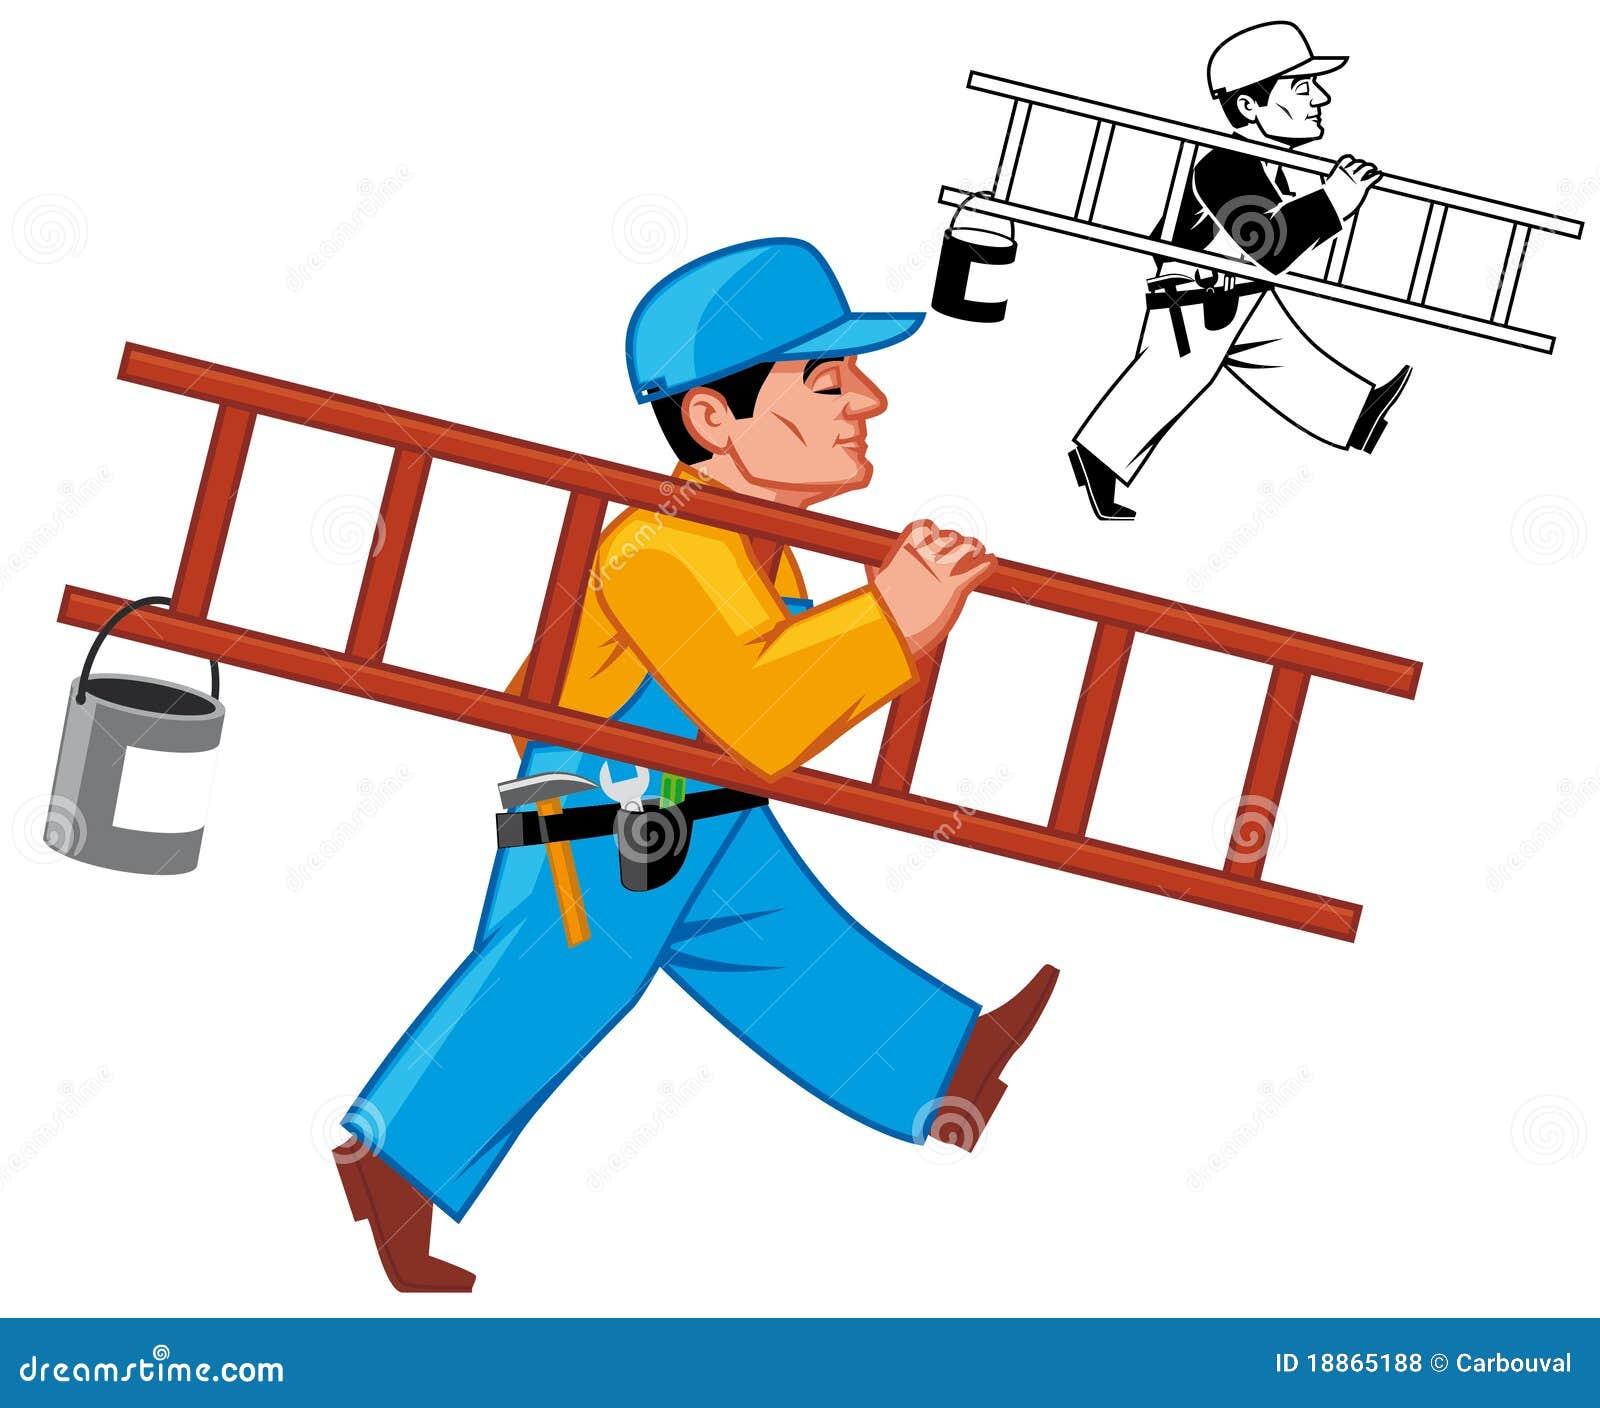 free clipart maintenance worker - photo #8